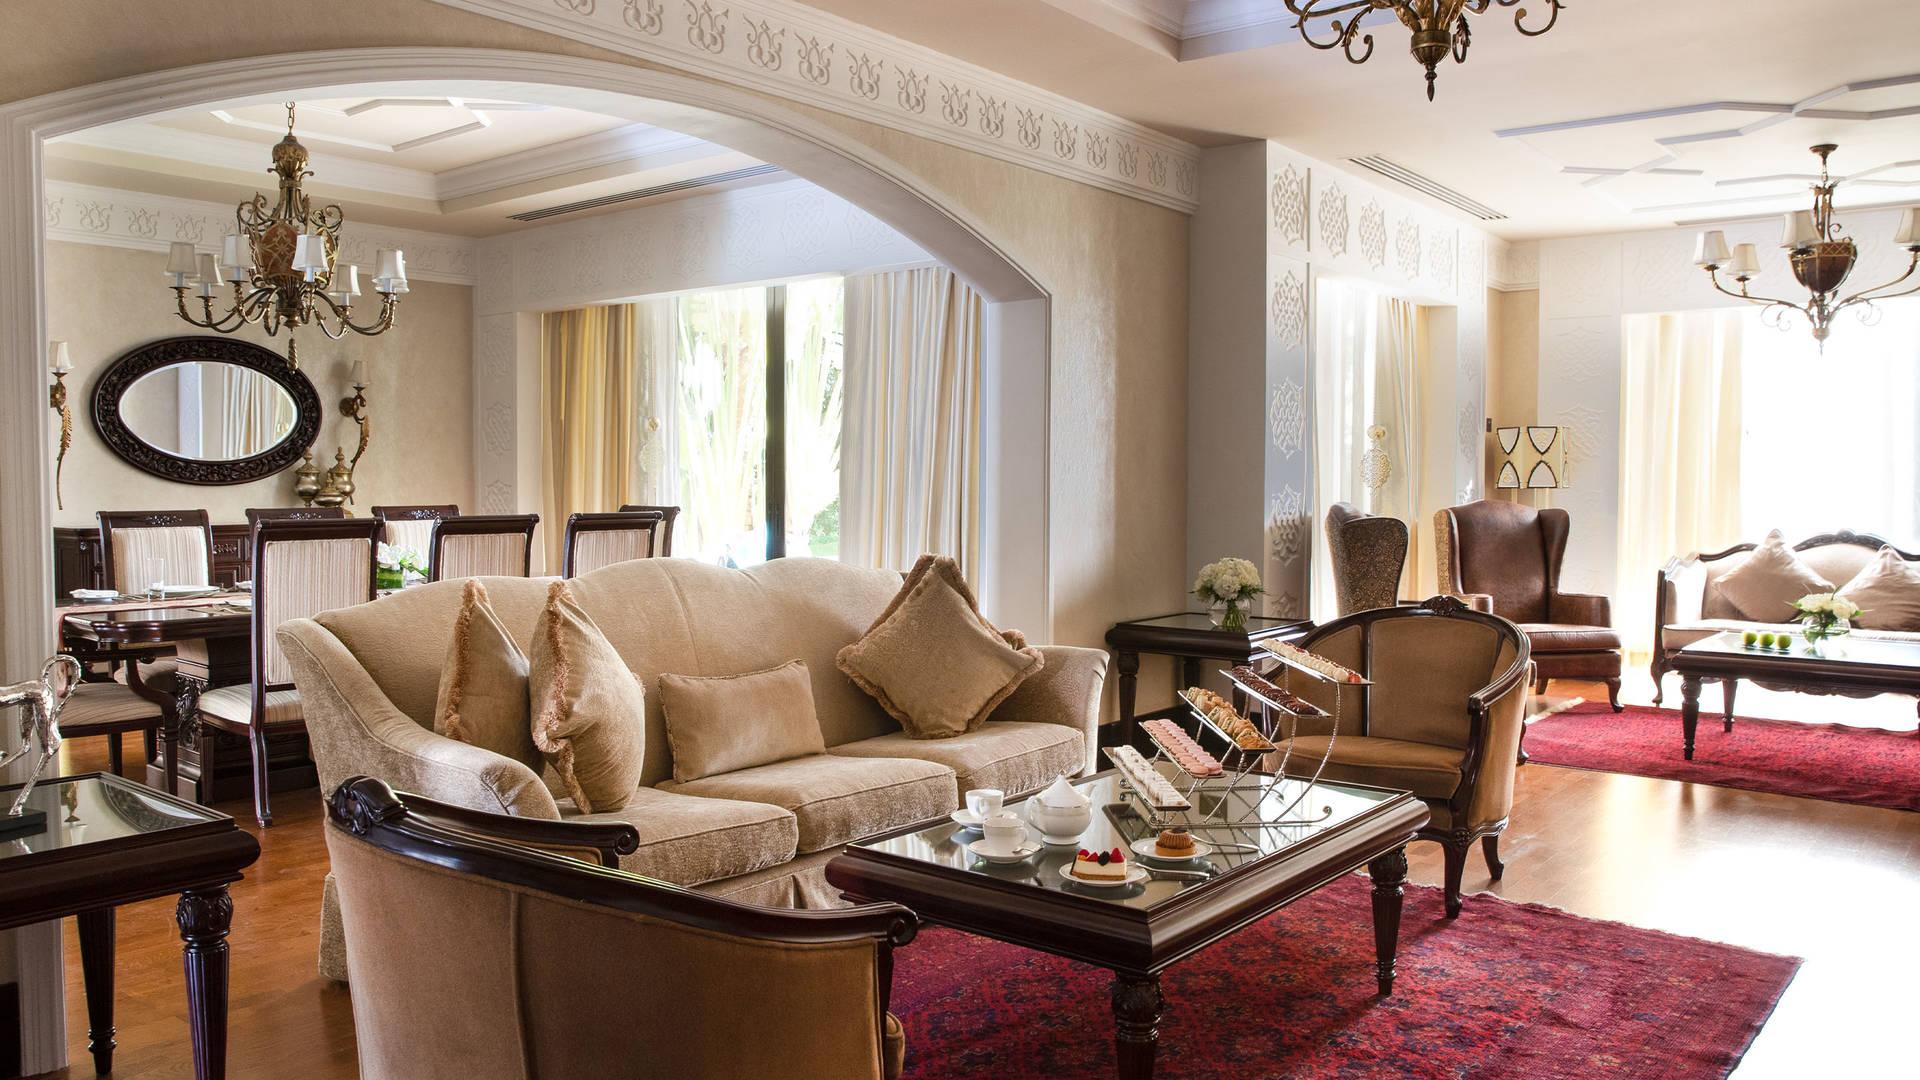 Jumeirah Zabeel Saray Royal Residence Beachview living room area